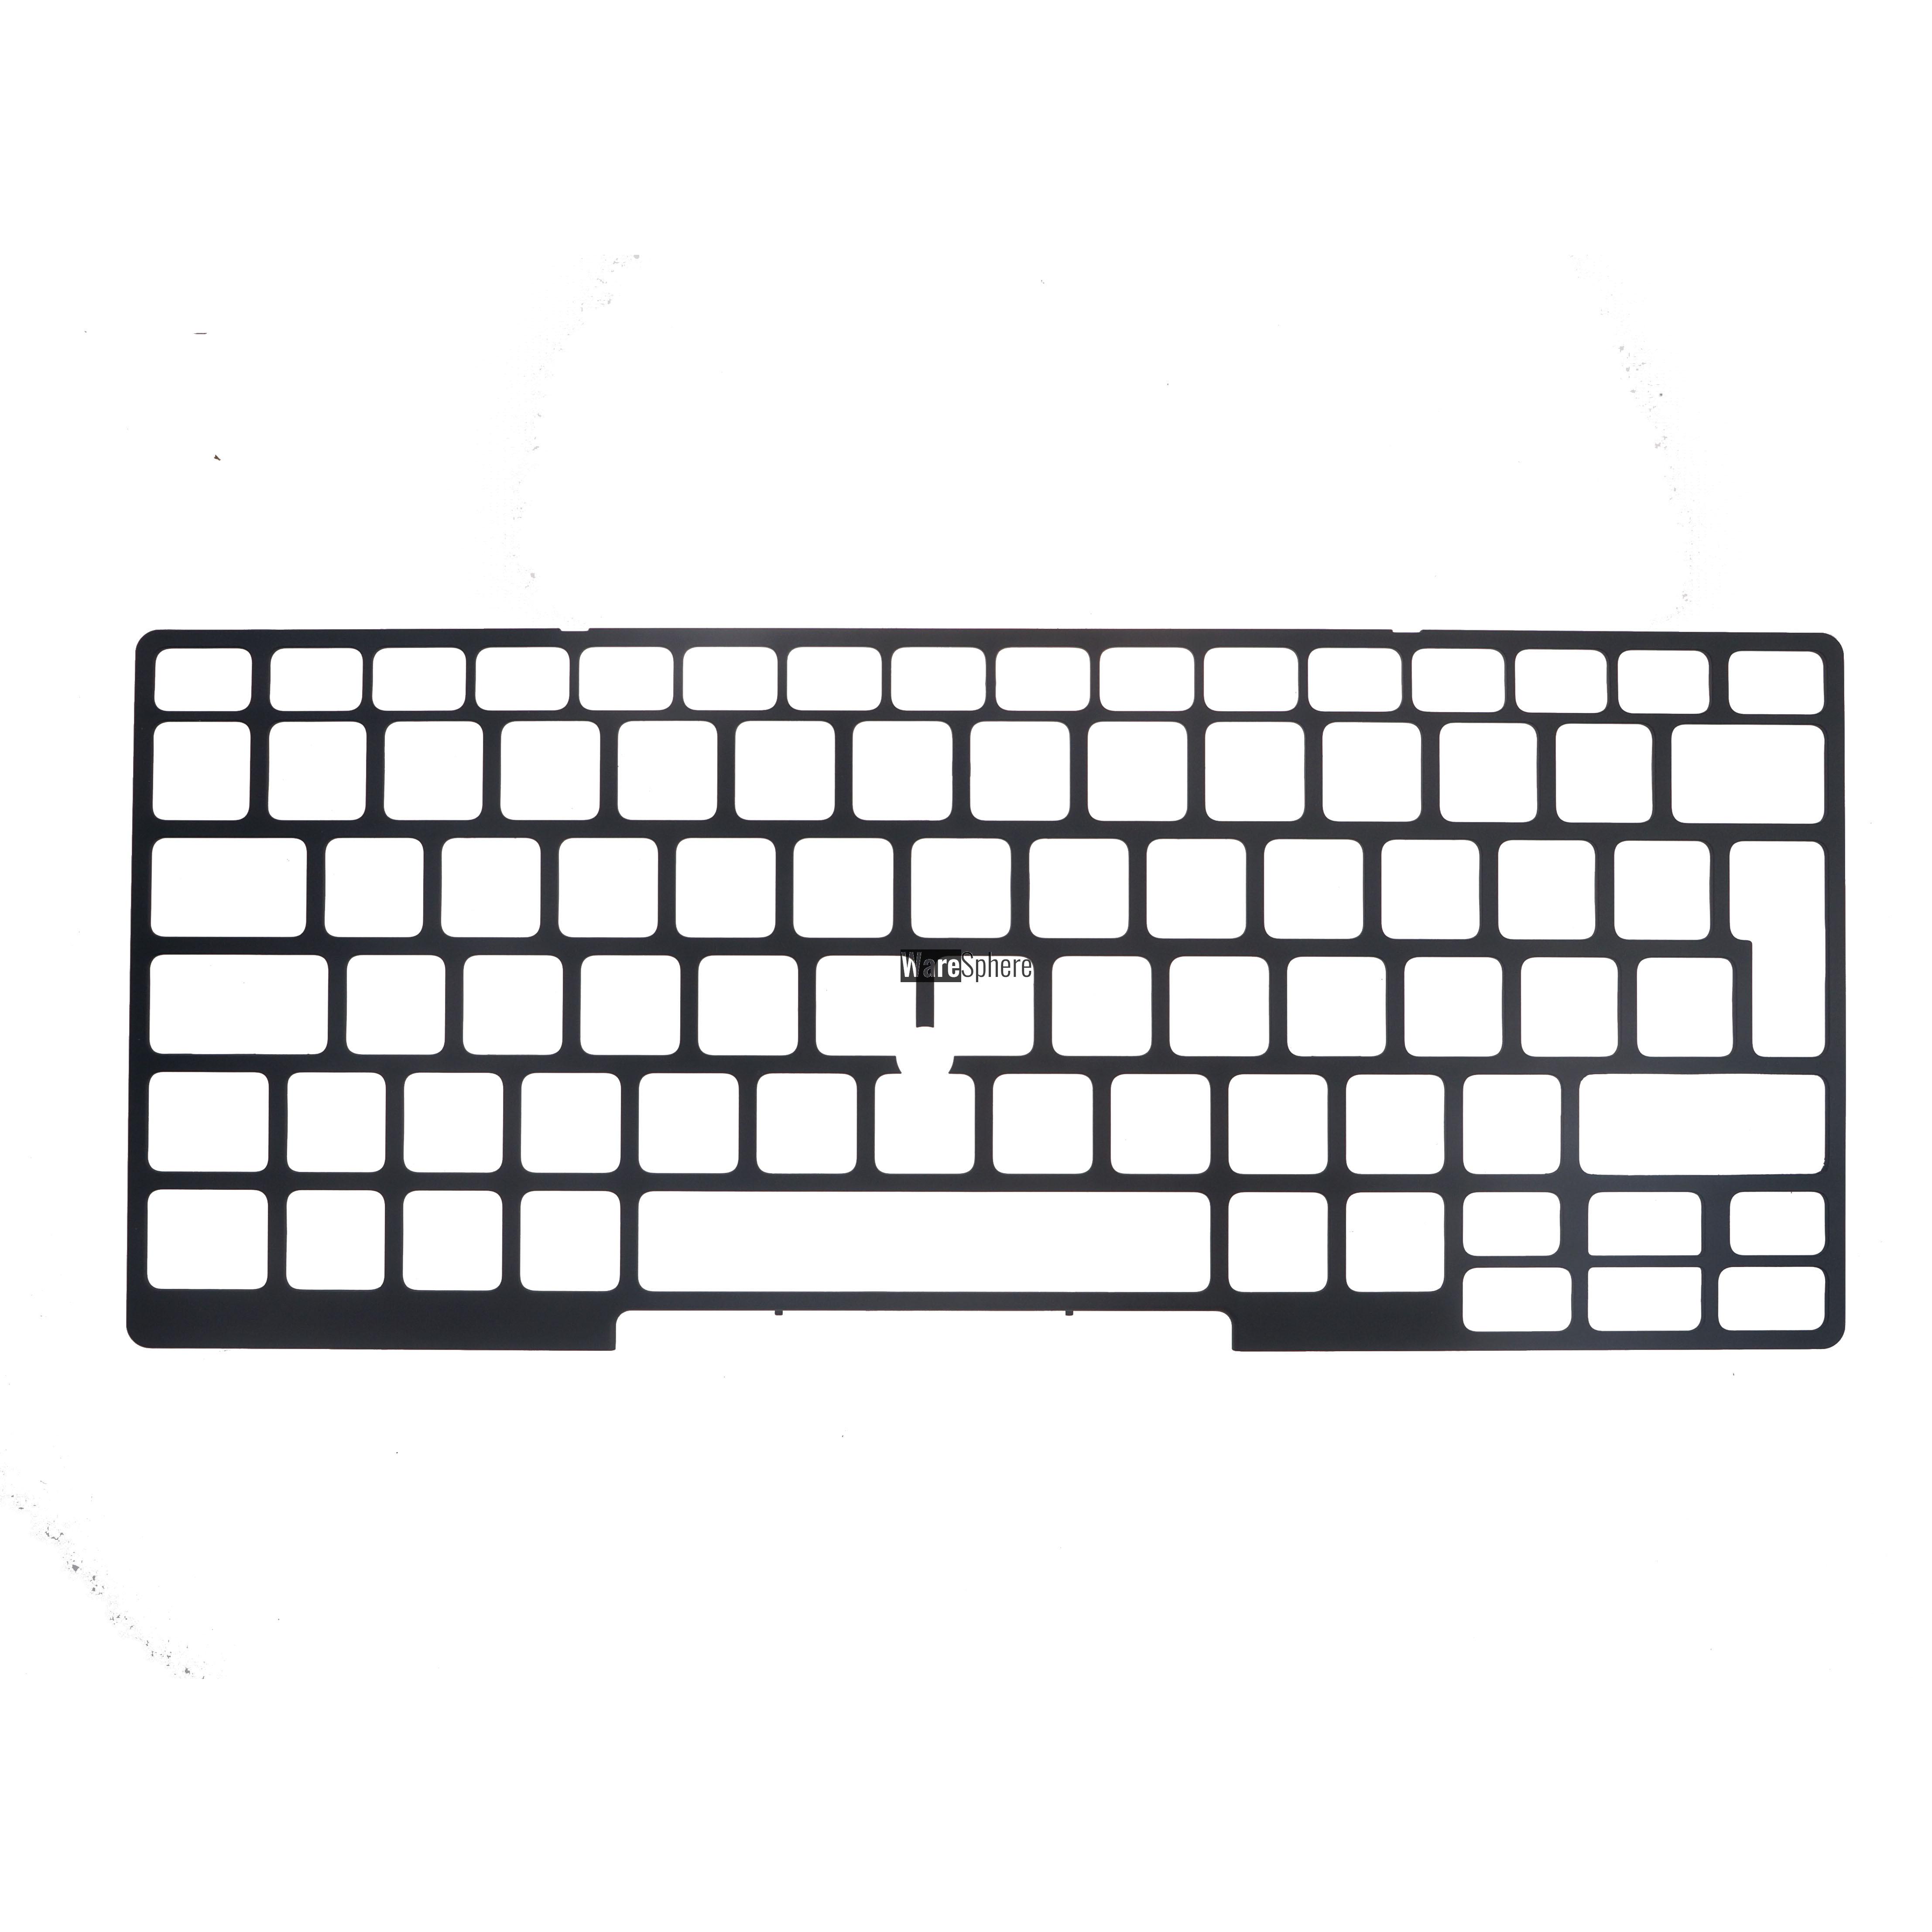 Keyboard Bezel For Dell latitude E7450 E5450 E3340 3340 00TV4Y 0TV4Y UK Black